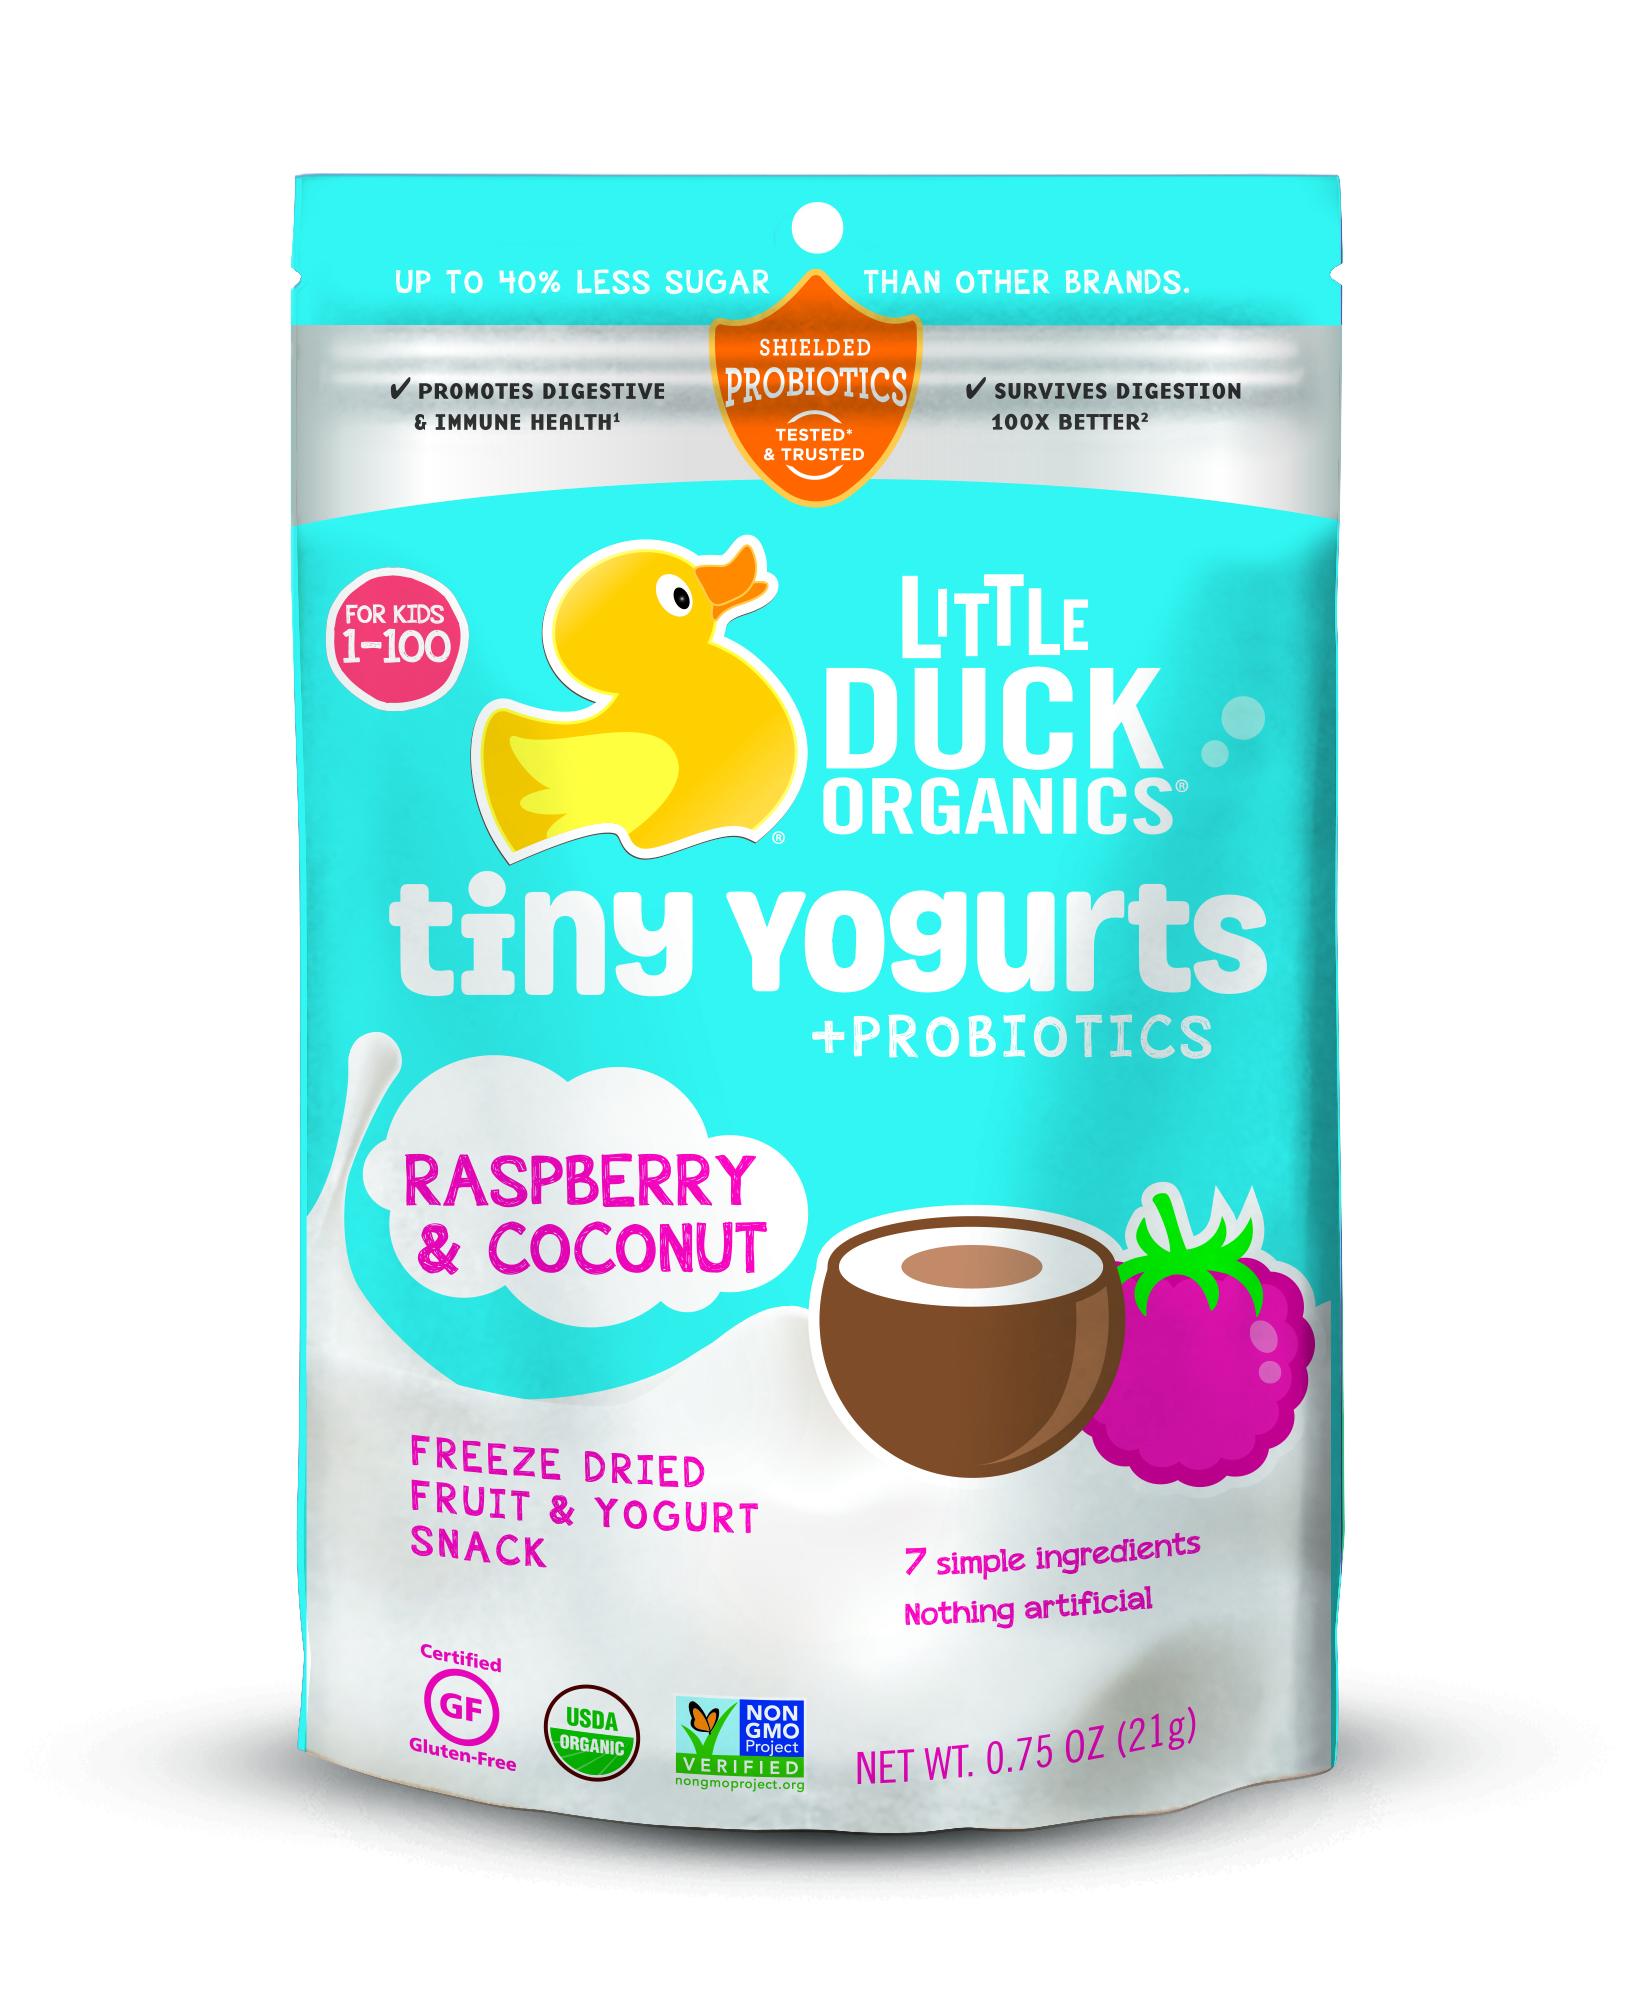 Little Duck Organics: tiny Yogurts + probiotics